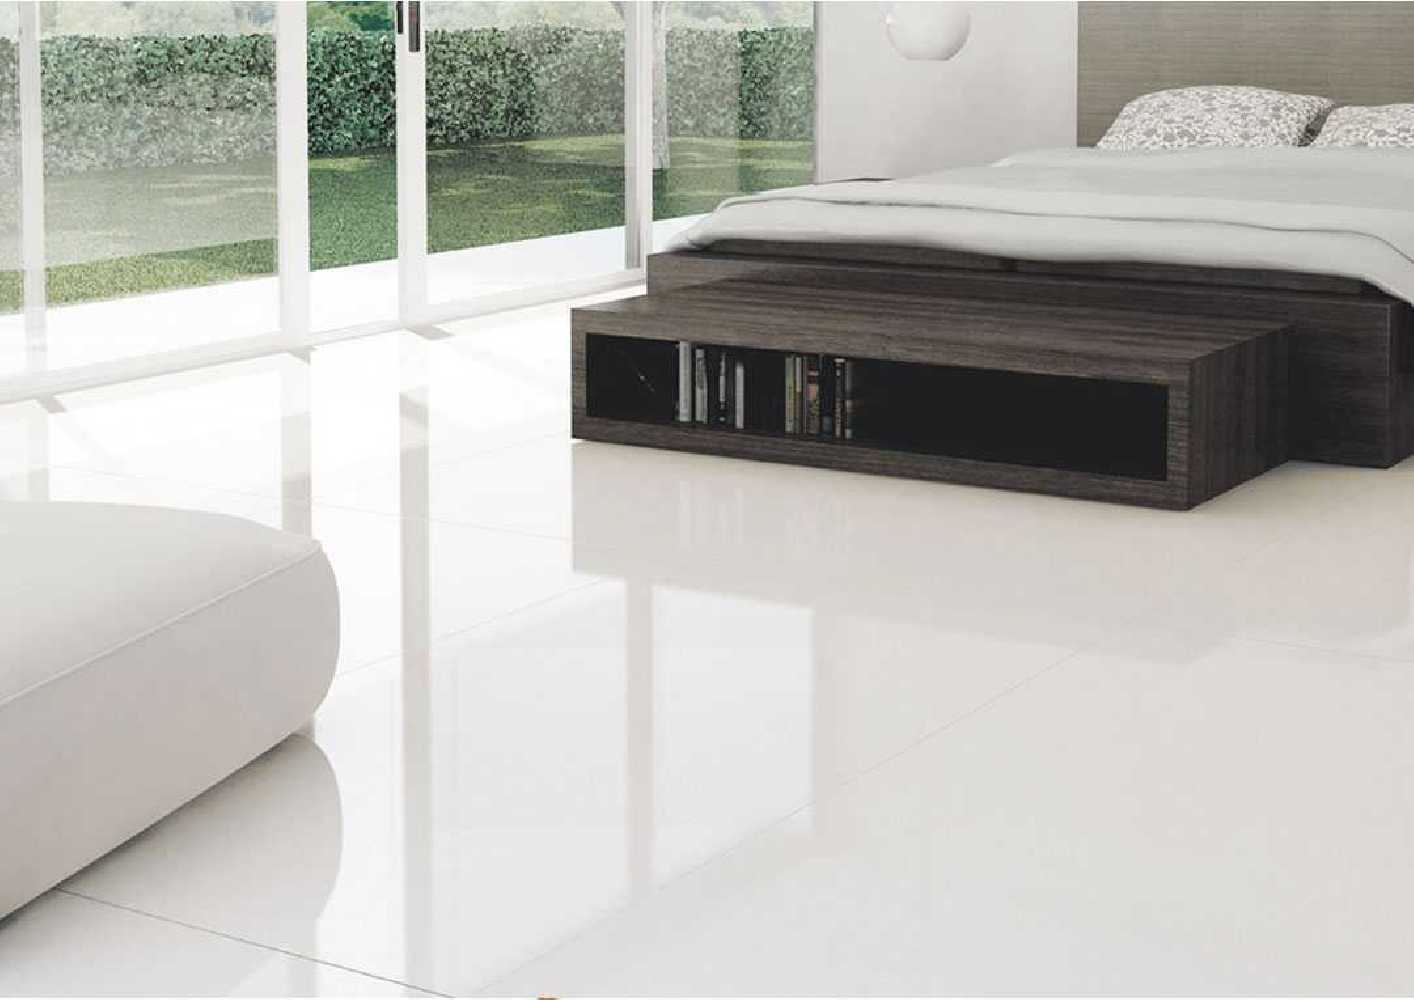 Carrelage Poli Brillant Blanc 80x80 Et 60x120 Ou Noir 80x80 Durstone